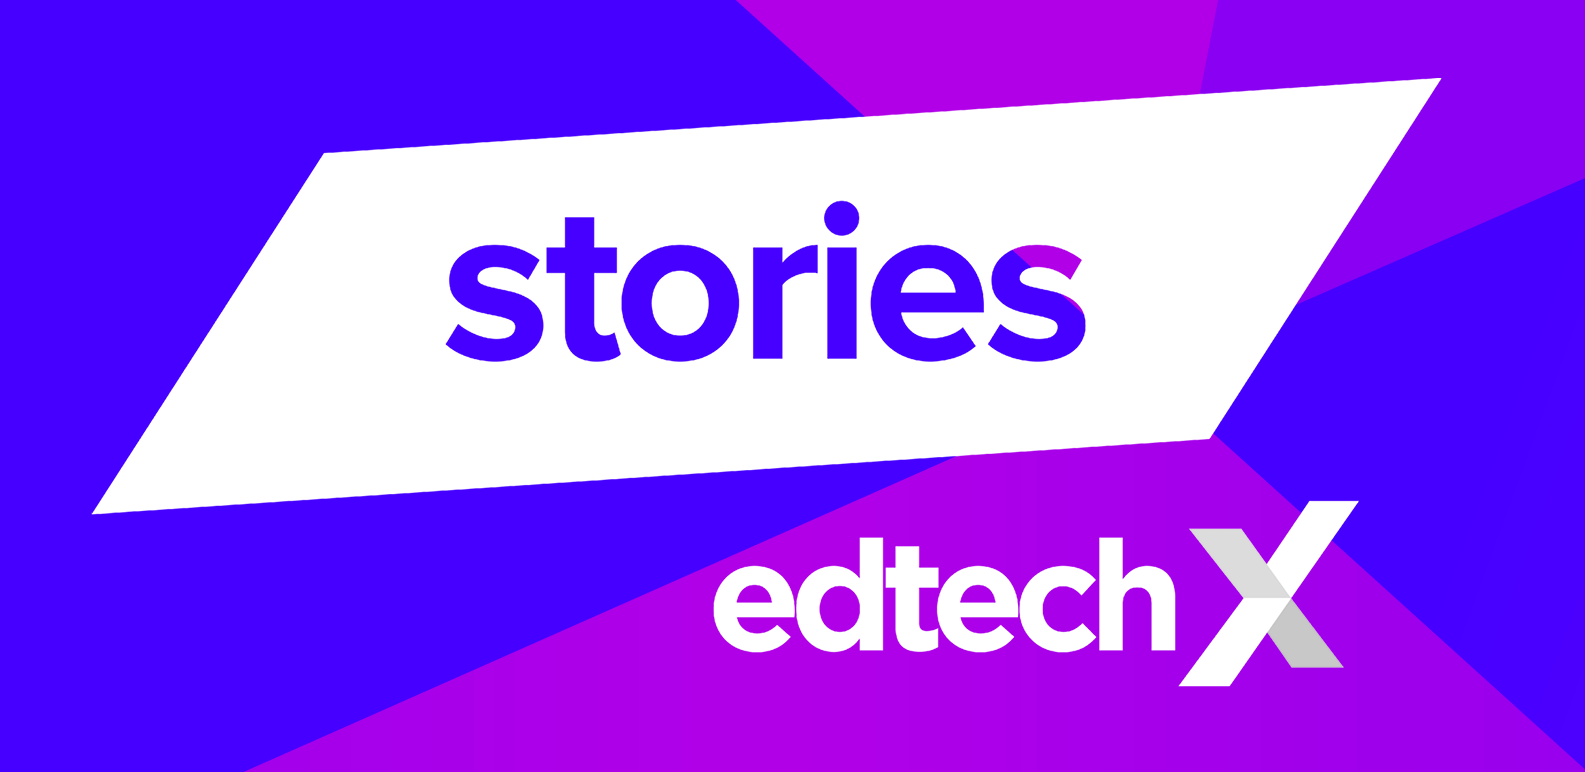 EdTechX Stories copy